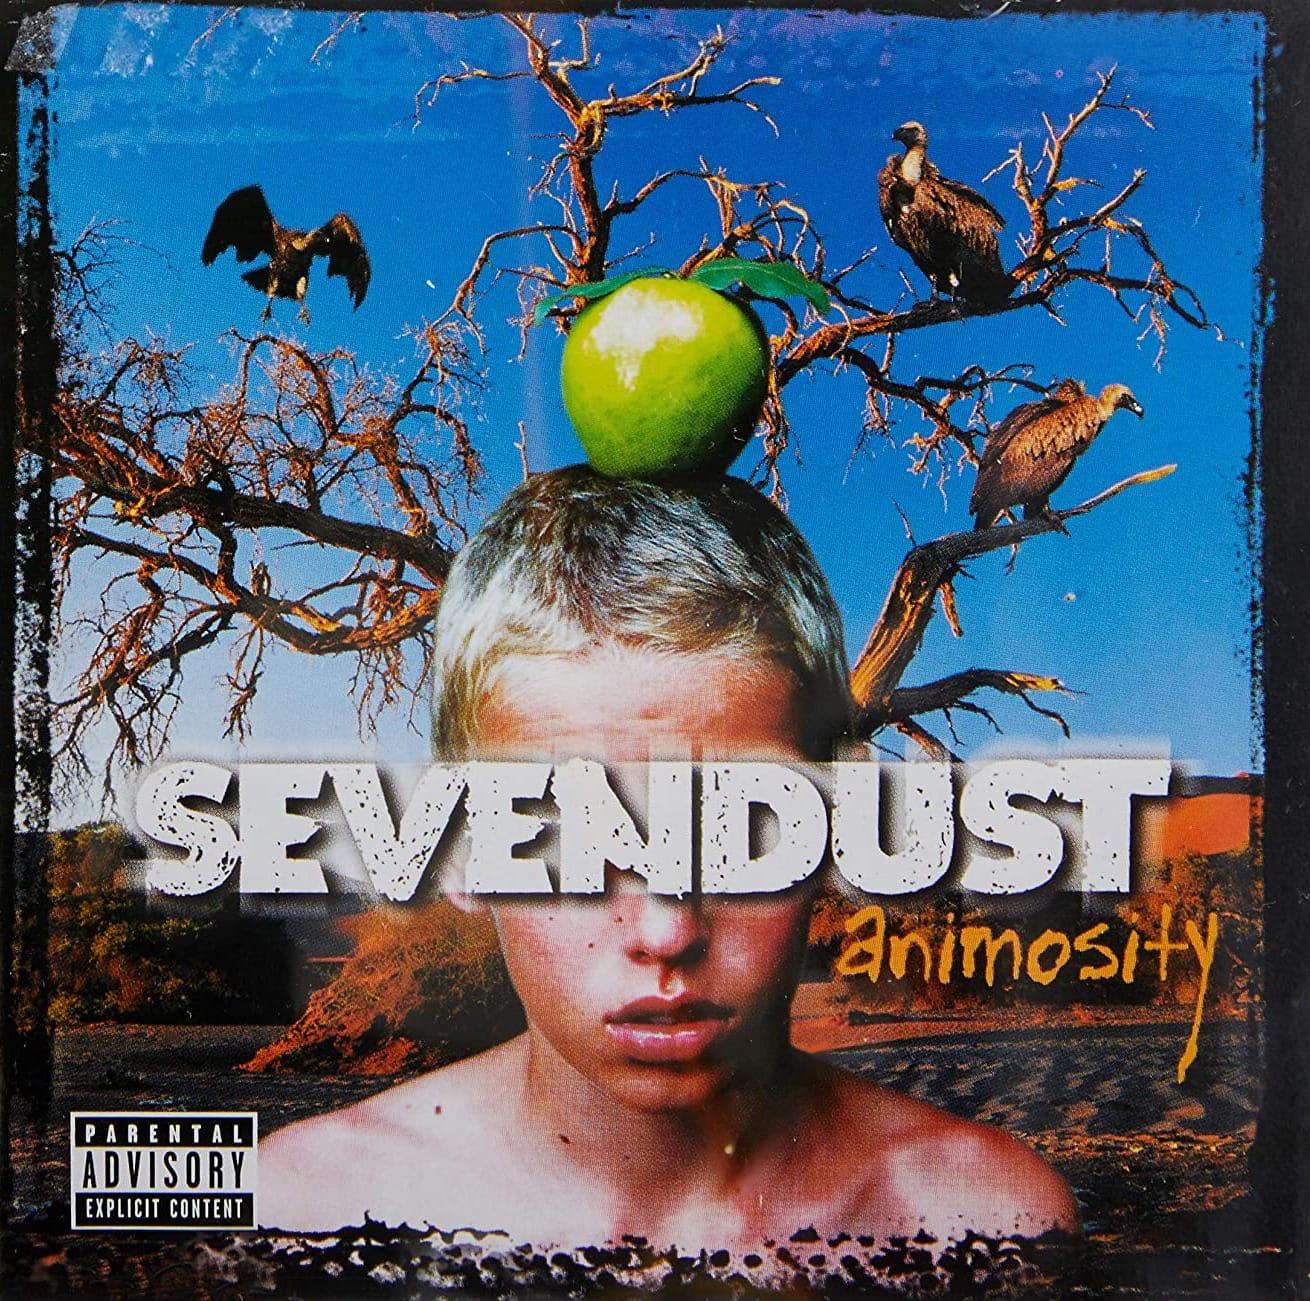 Sevendust - Animosity (2001)